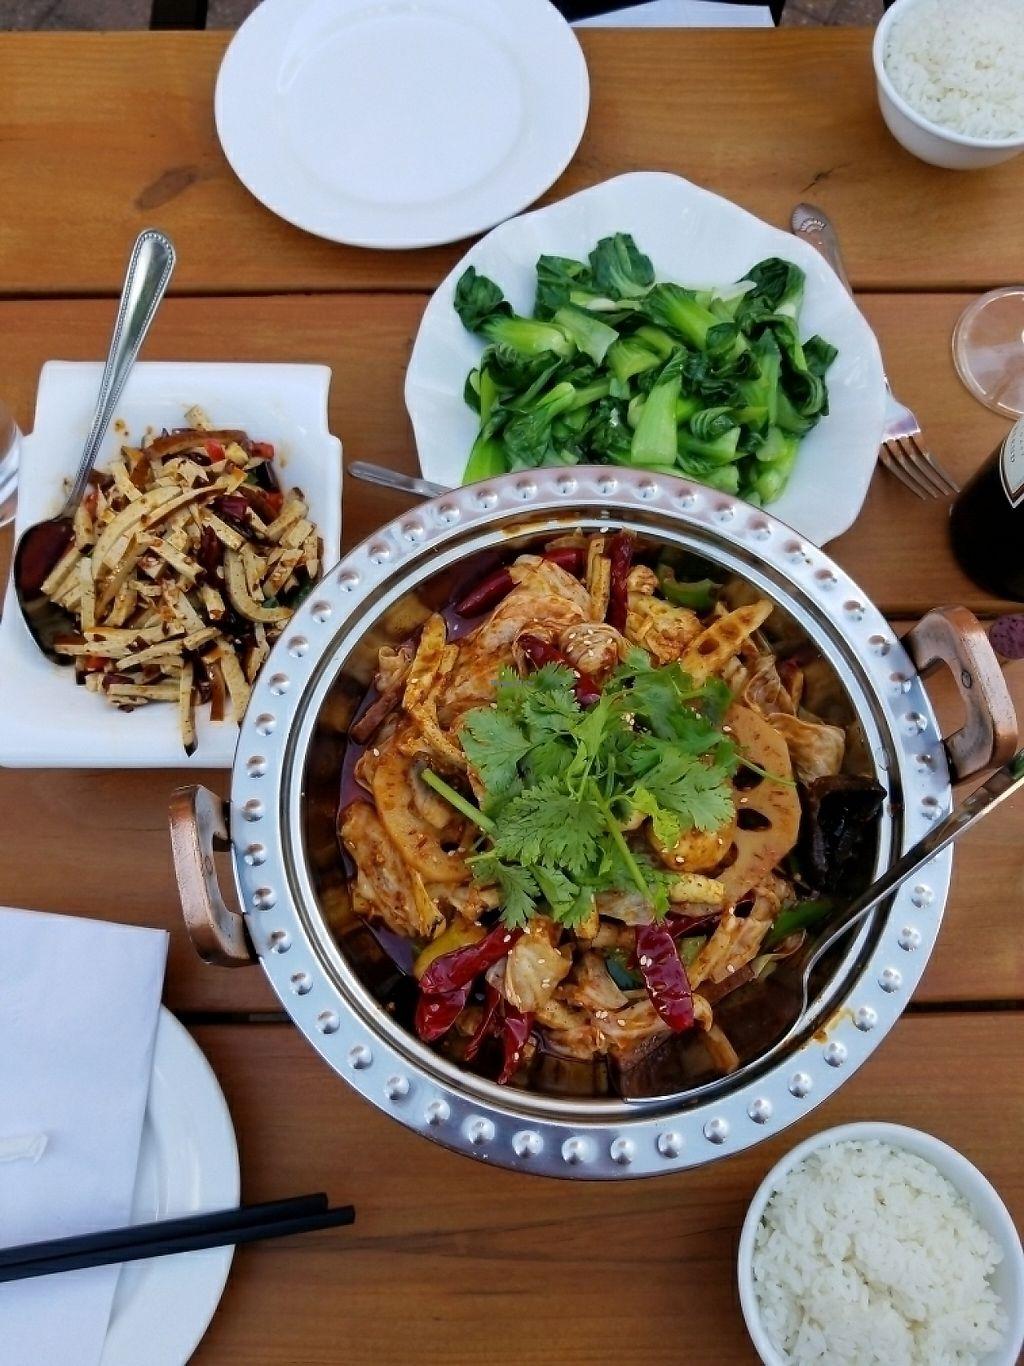 "Photo of Chef Tan  by <a href=""/members/profile/tikhonova87"">tikhonova87</a> <br/>Bok Choy, Veggy hot pot, bean curd <br/> June 3, 2017  - <a href='/contact/abuse/image/93346/265426'>Report</a>"